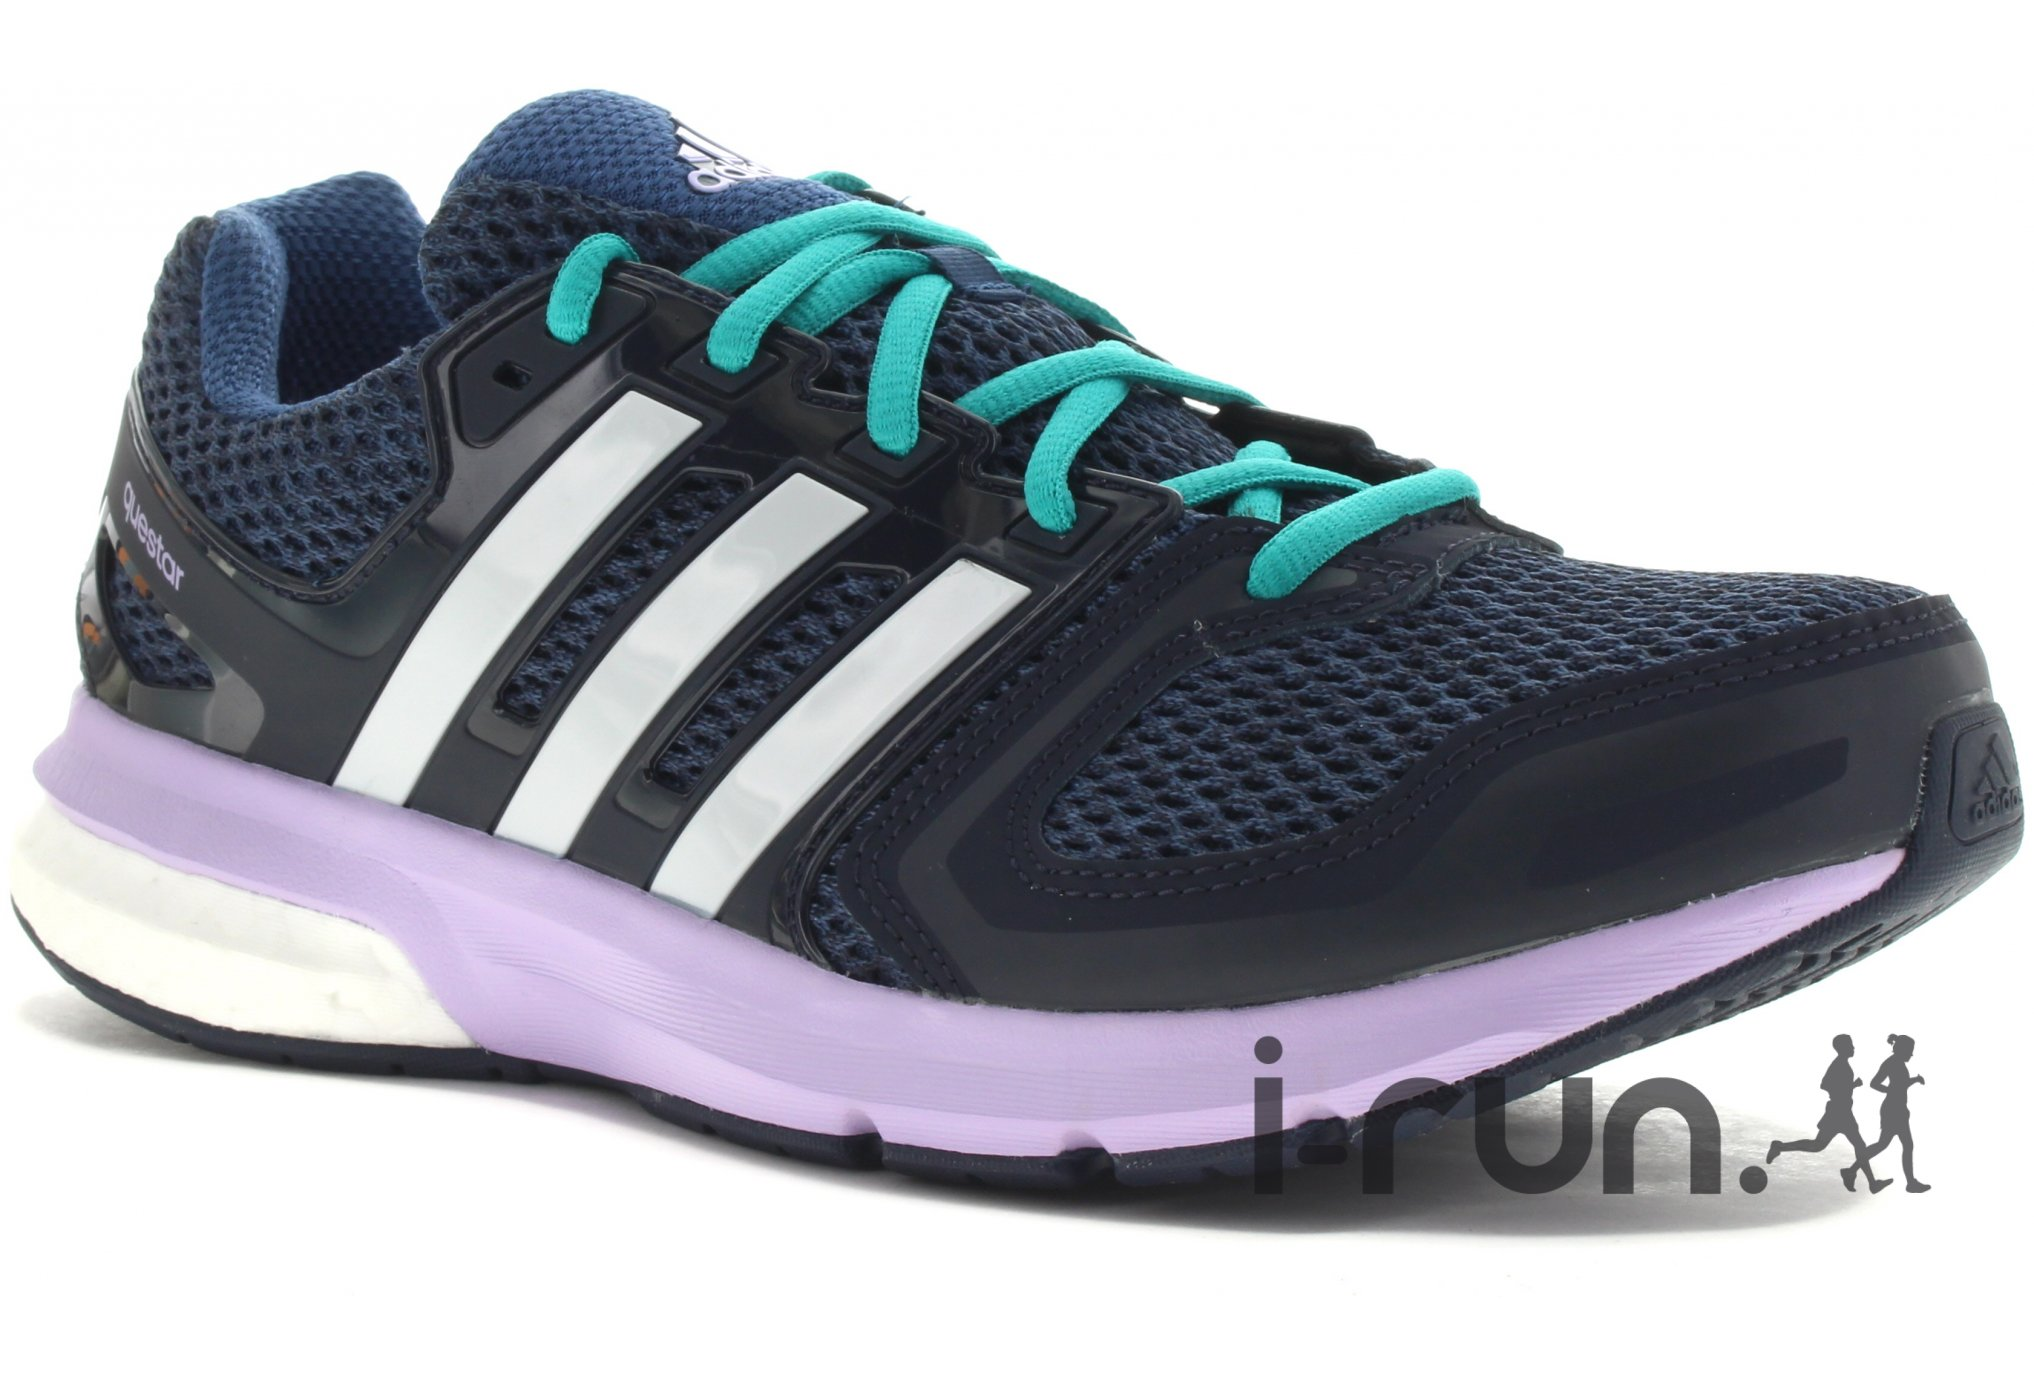 Adidas Questar boost w chaussures running femme